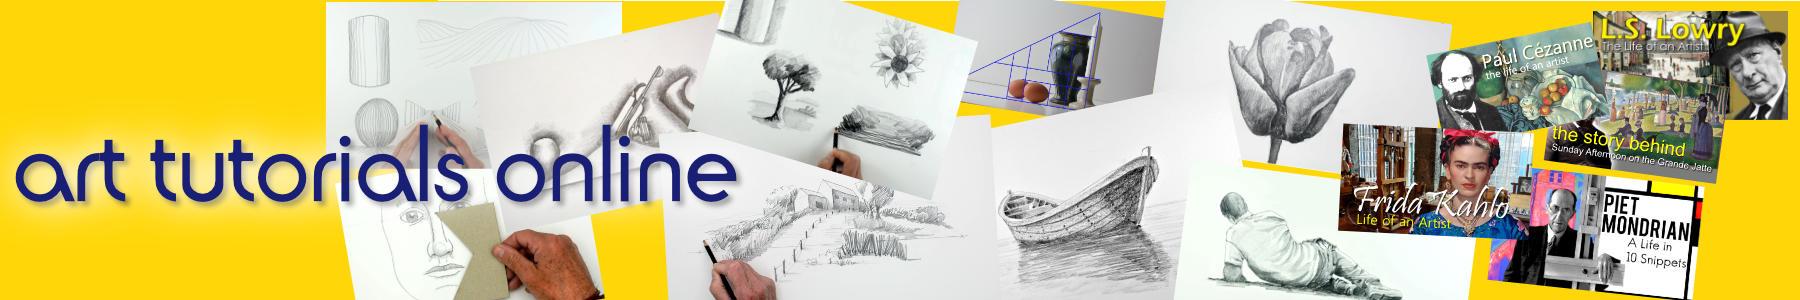 Header for Art Tutorials Online